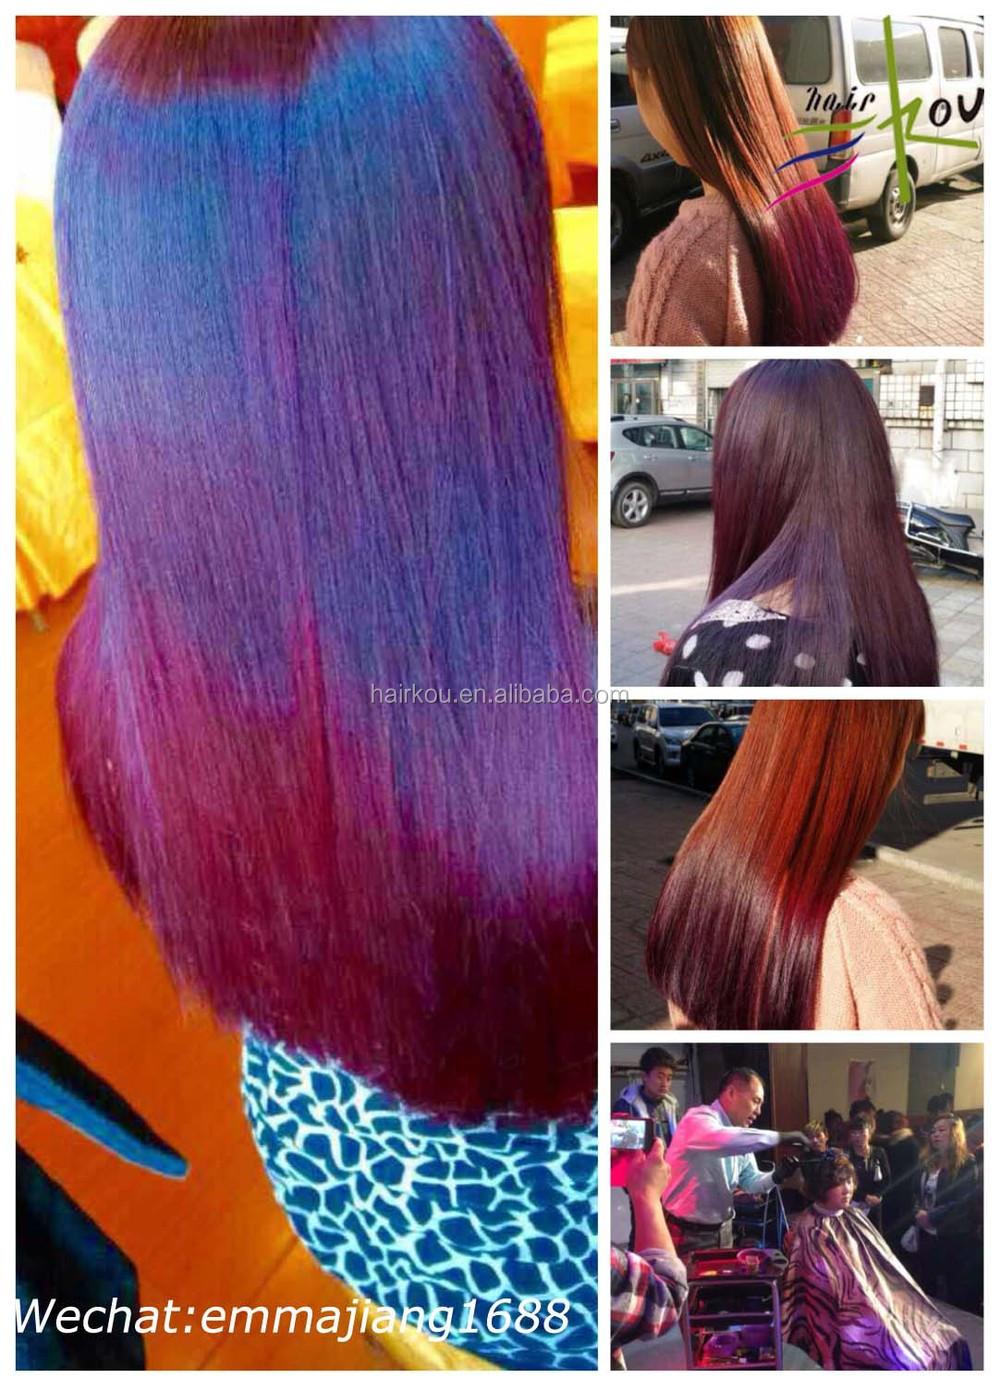 Permanent Hair Color Hot Pink Hair Dye Dirty Blonde Hair Dye Buy